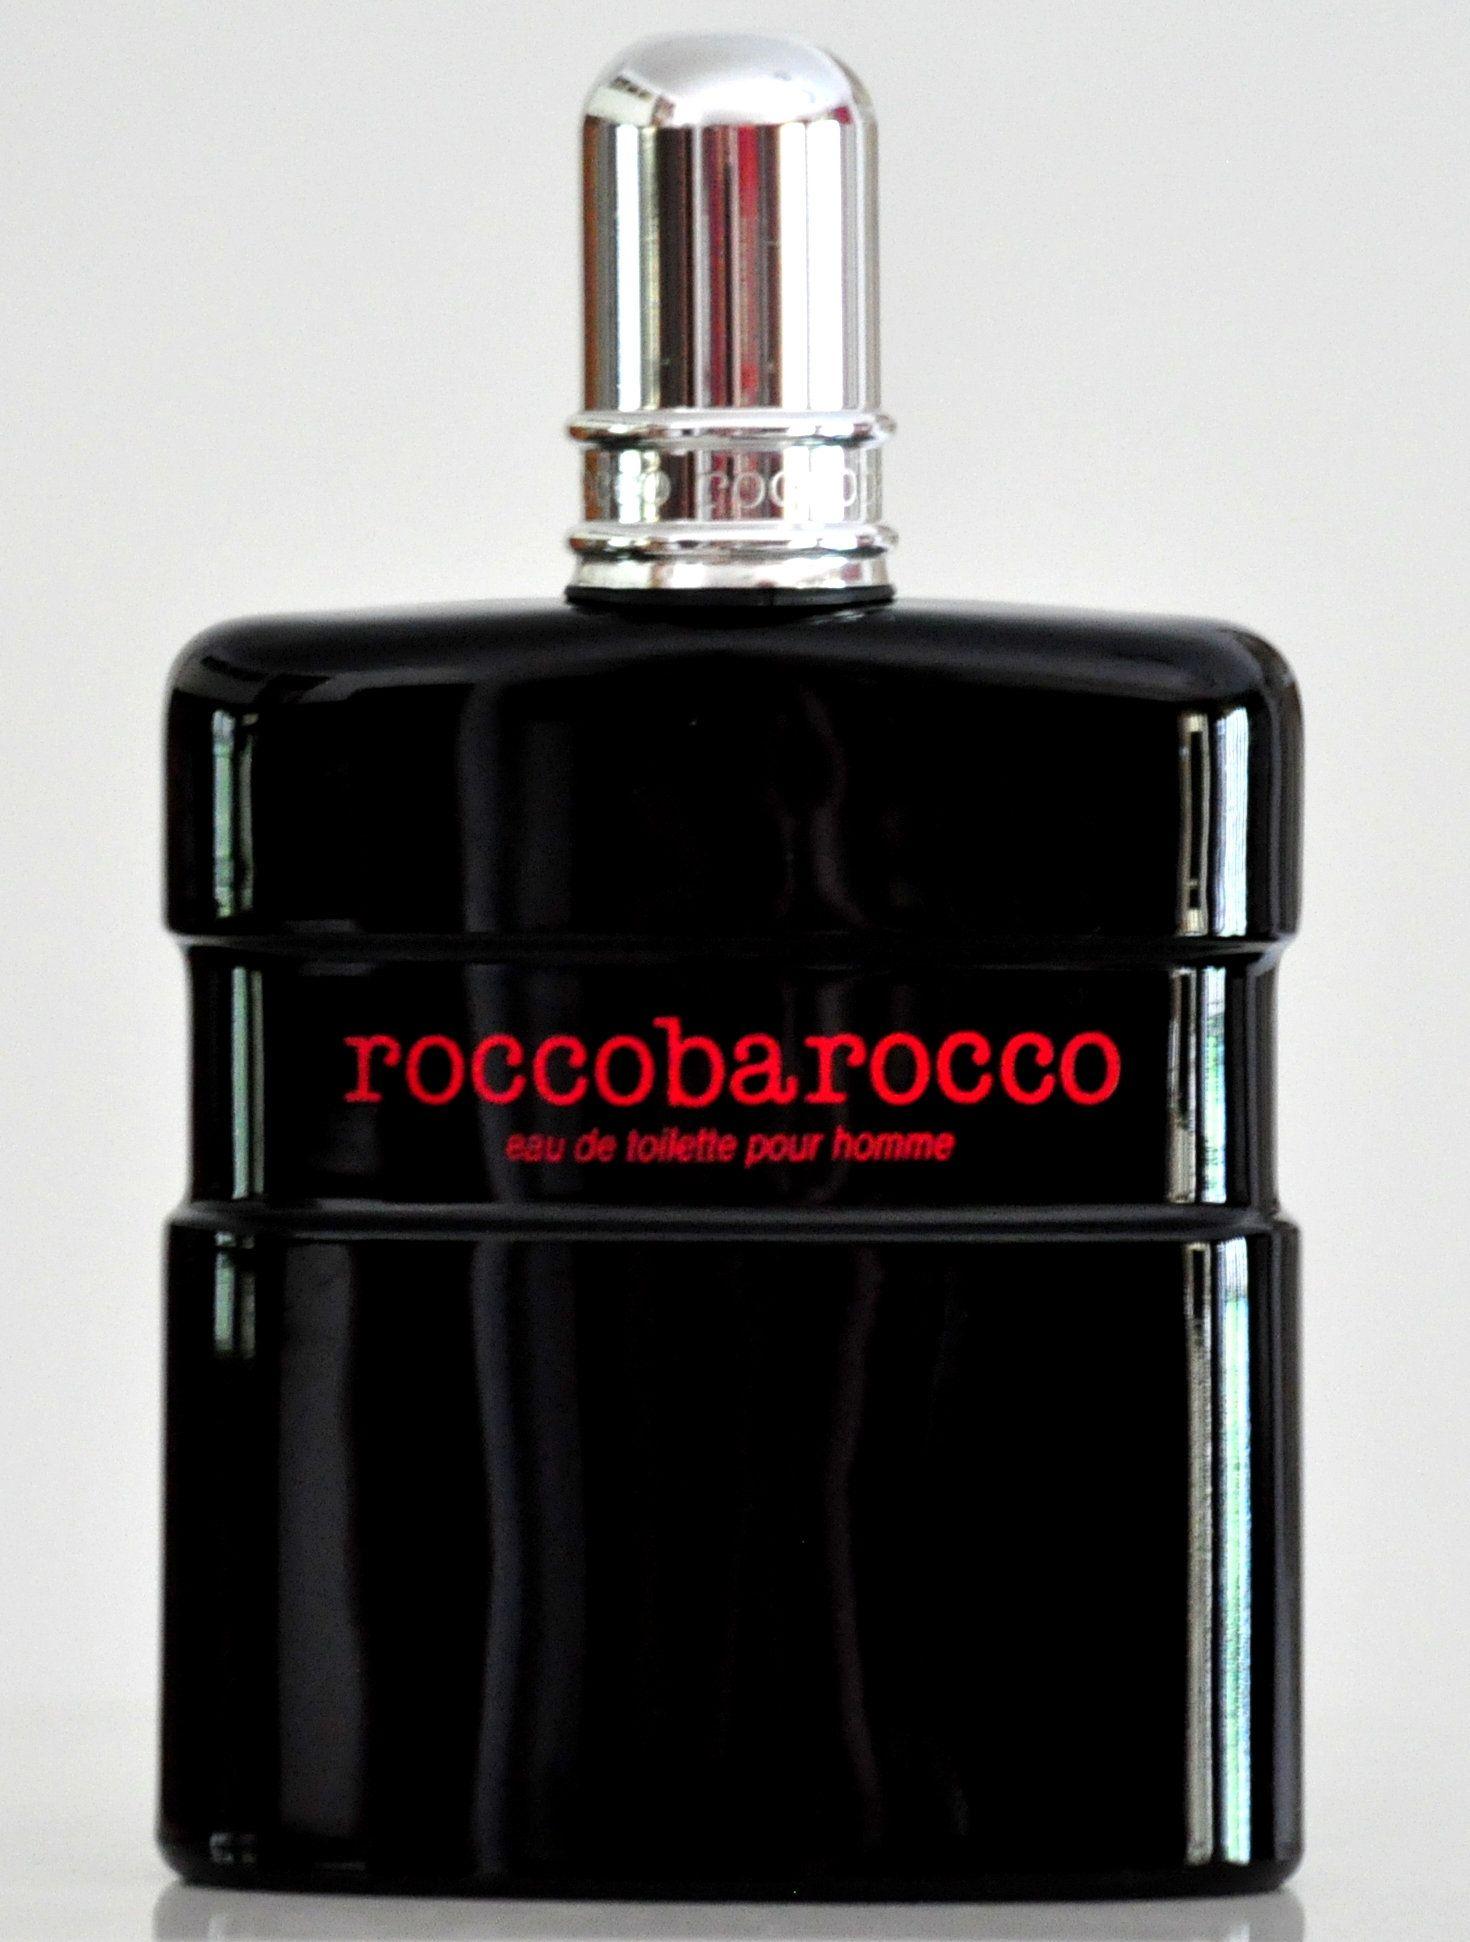 Rocco Barocco Roccobarocco Pour Homme Eau De Toilette Edt Etsy In 2020 Perfume Bottles Vintage Perfume Perfumery